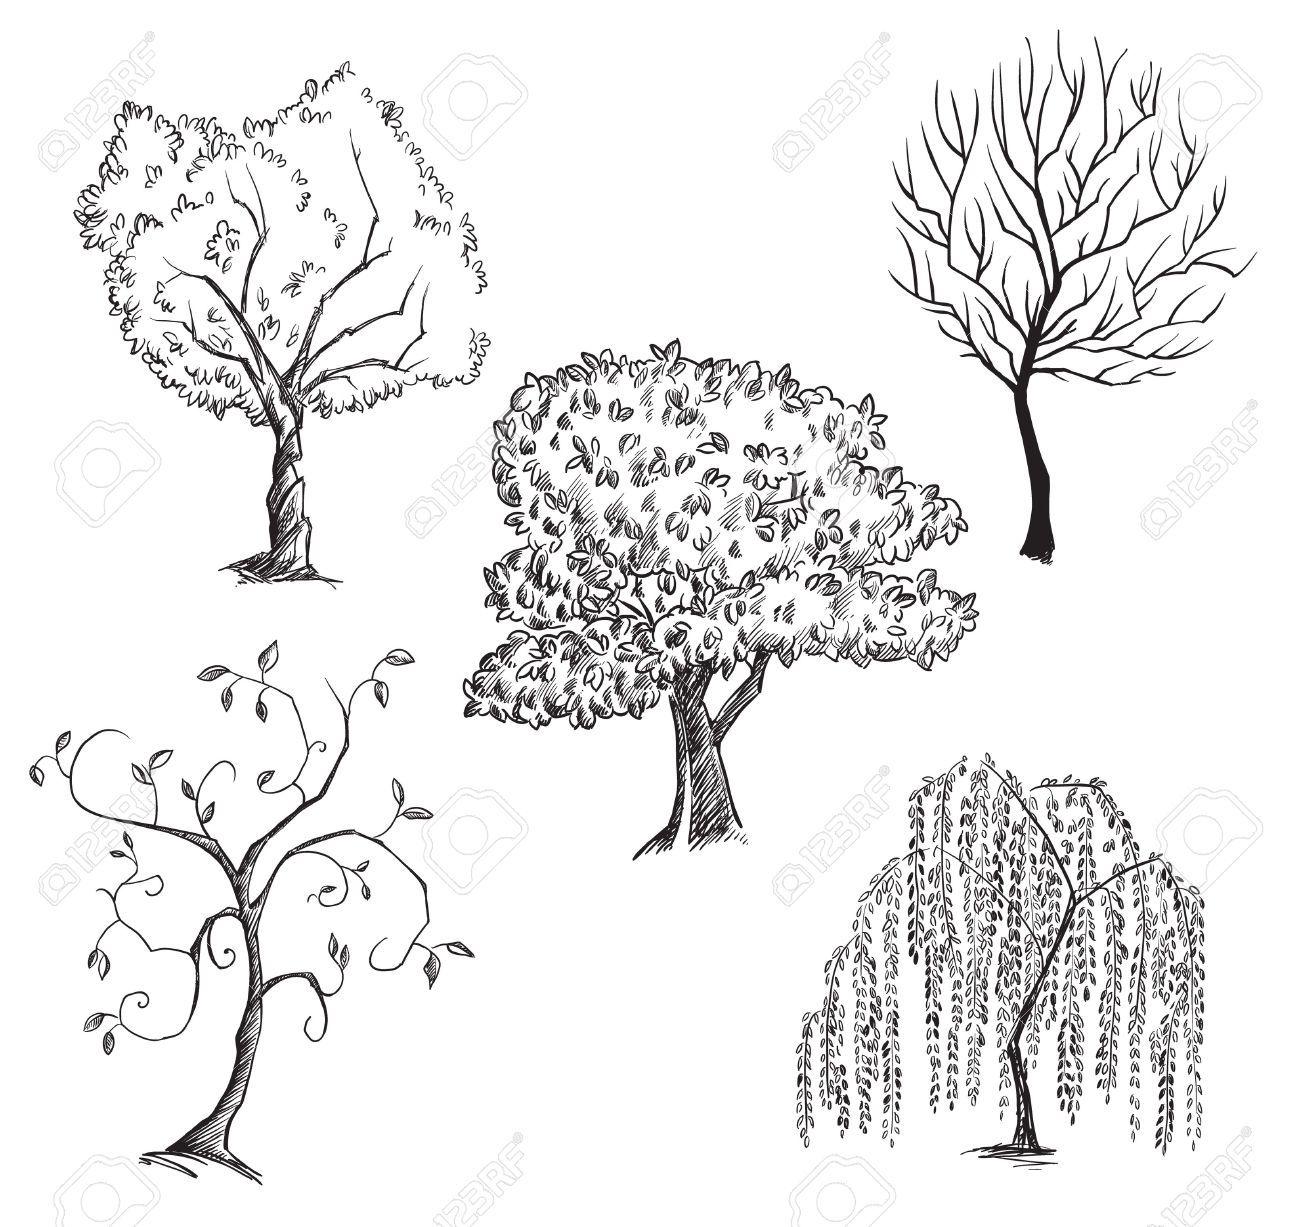 Home design bilder einzigen stock image result for plum tree blossom drawing  rando in